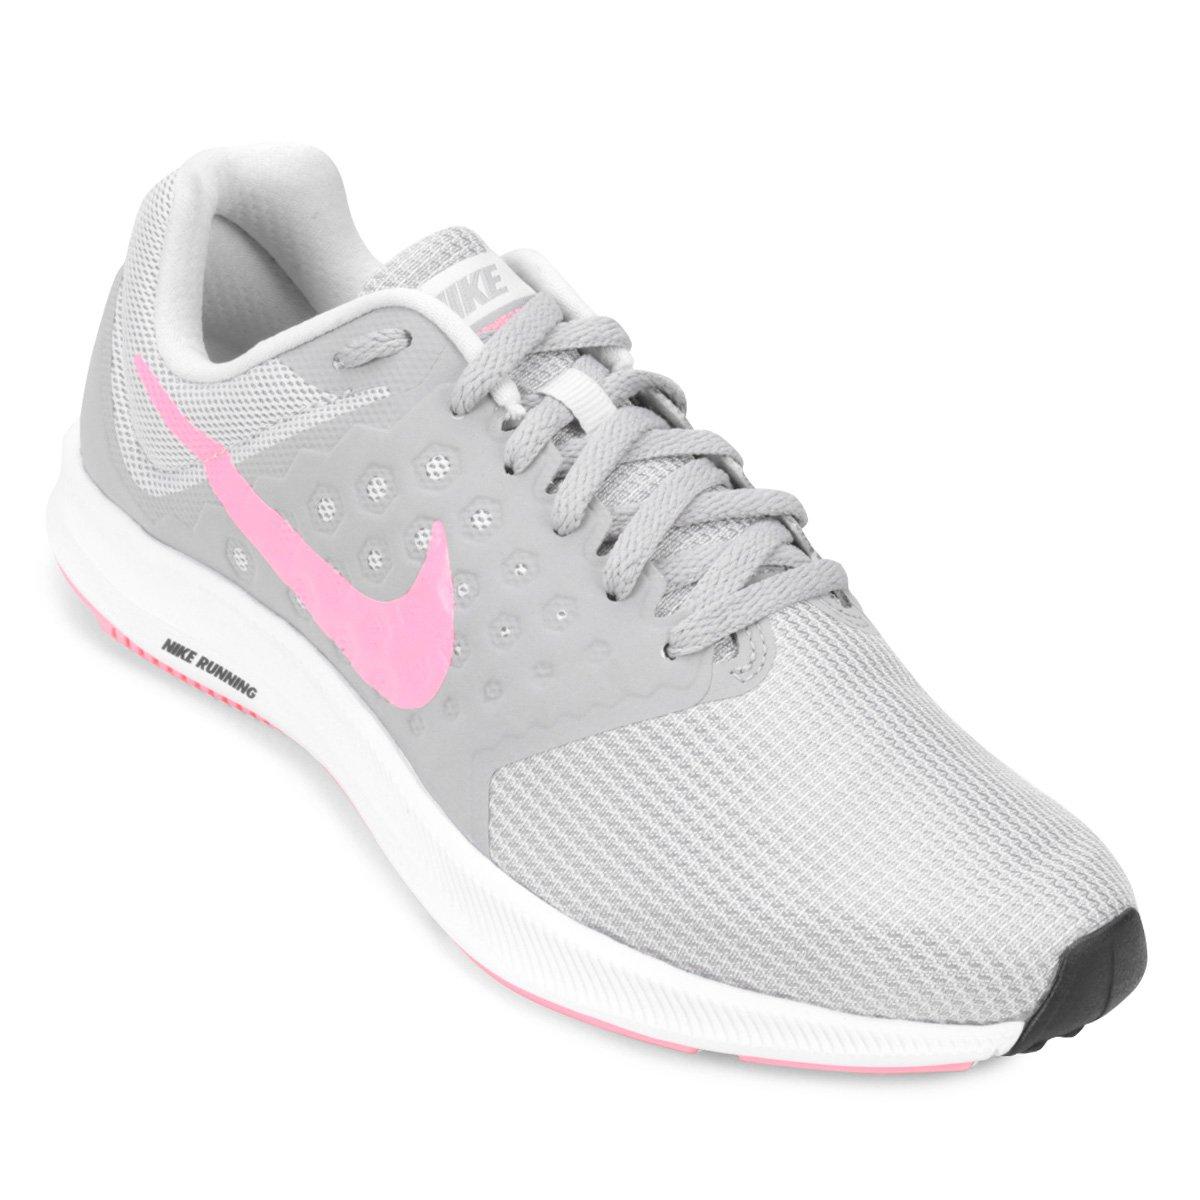 Tênis Nike Downshifter 7 Feminino Cinza E Rosa